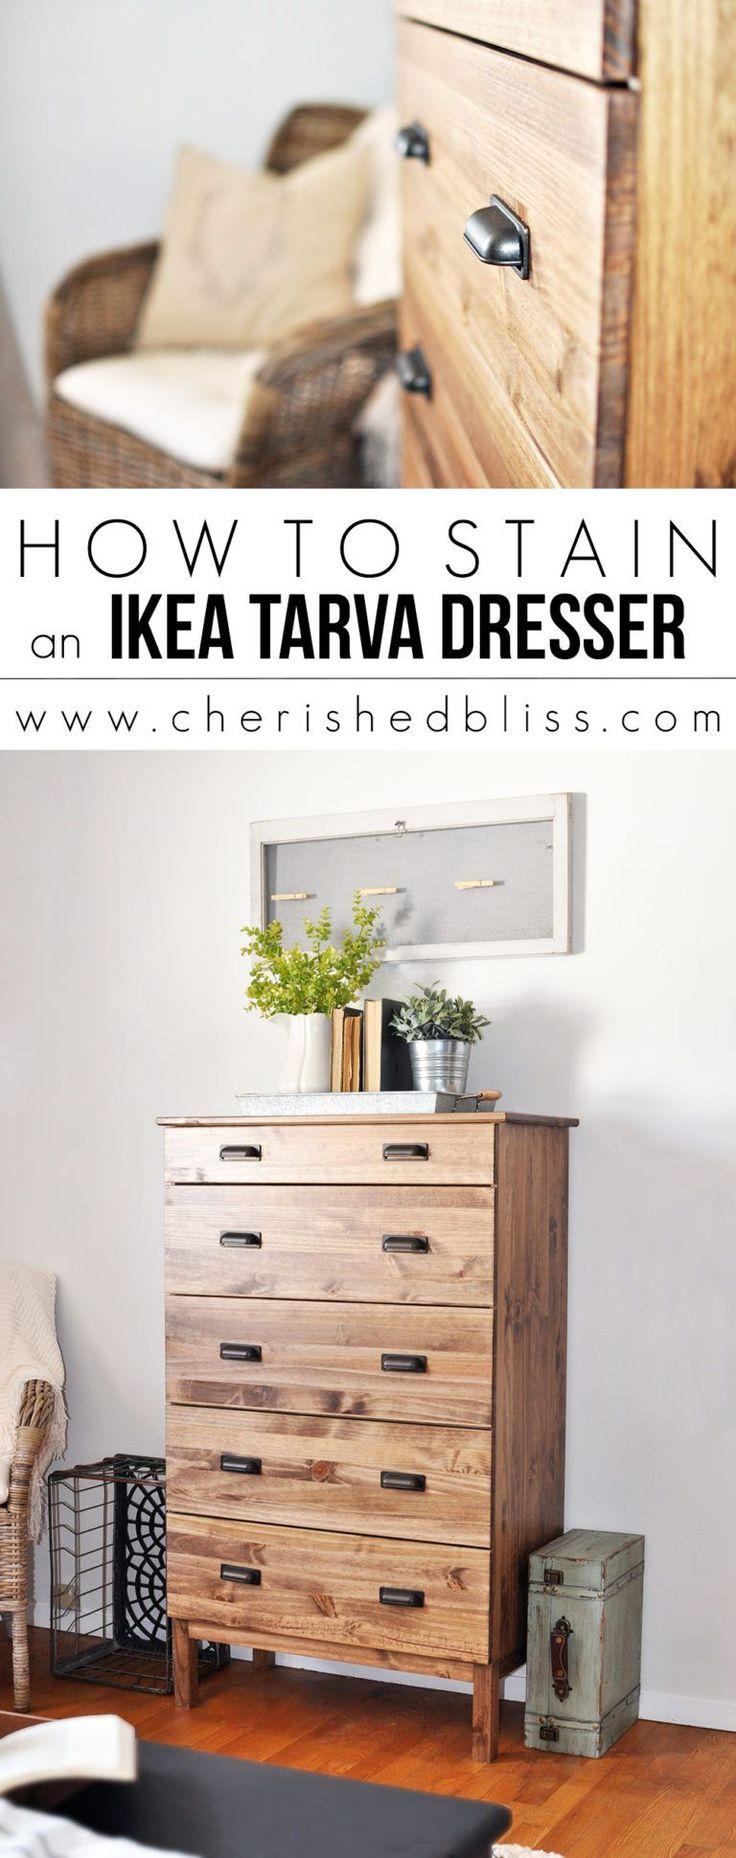 19 best Ikea Tarva Hacks images on Pinterest | Cabinets, DIY and ...